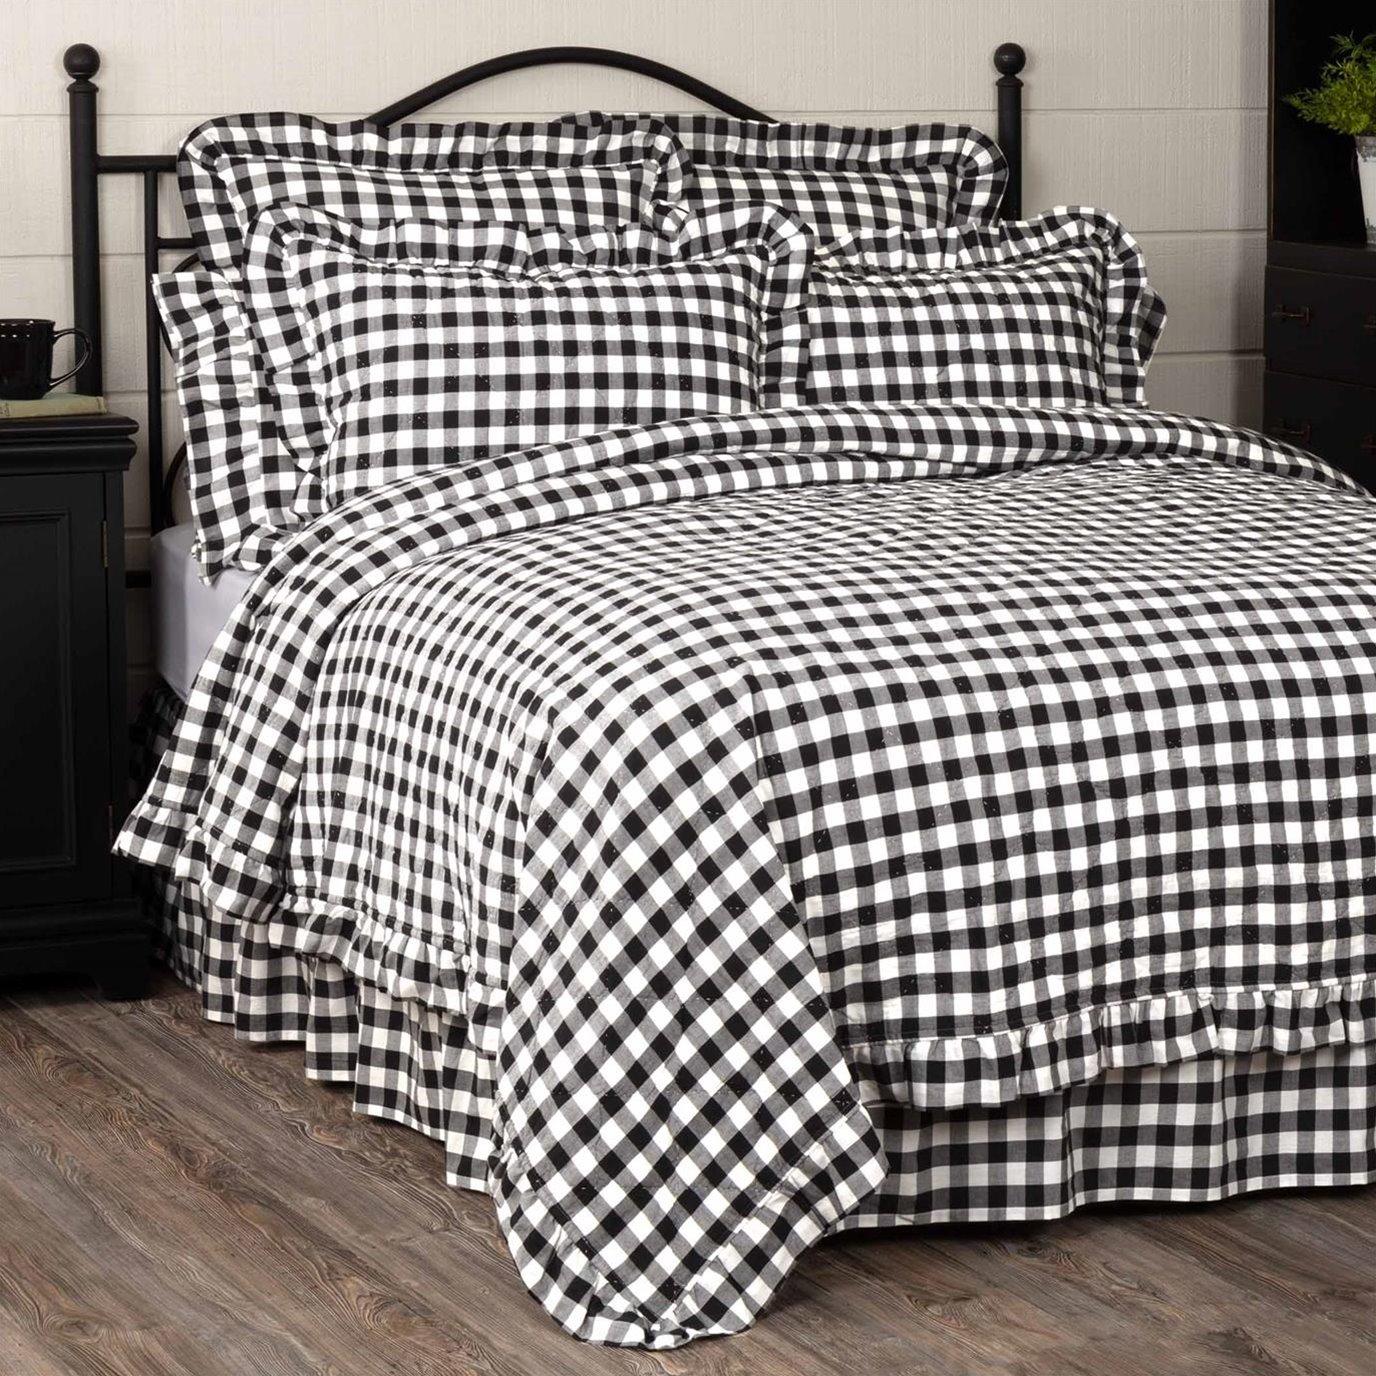 Annie Buffalo Black Check Ruffled California King Quilt Coverlet 130Wx115L